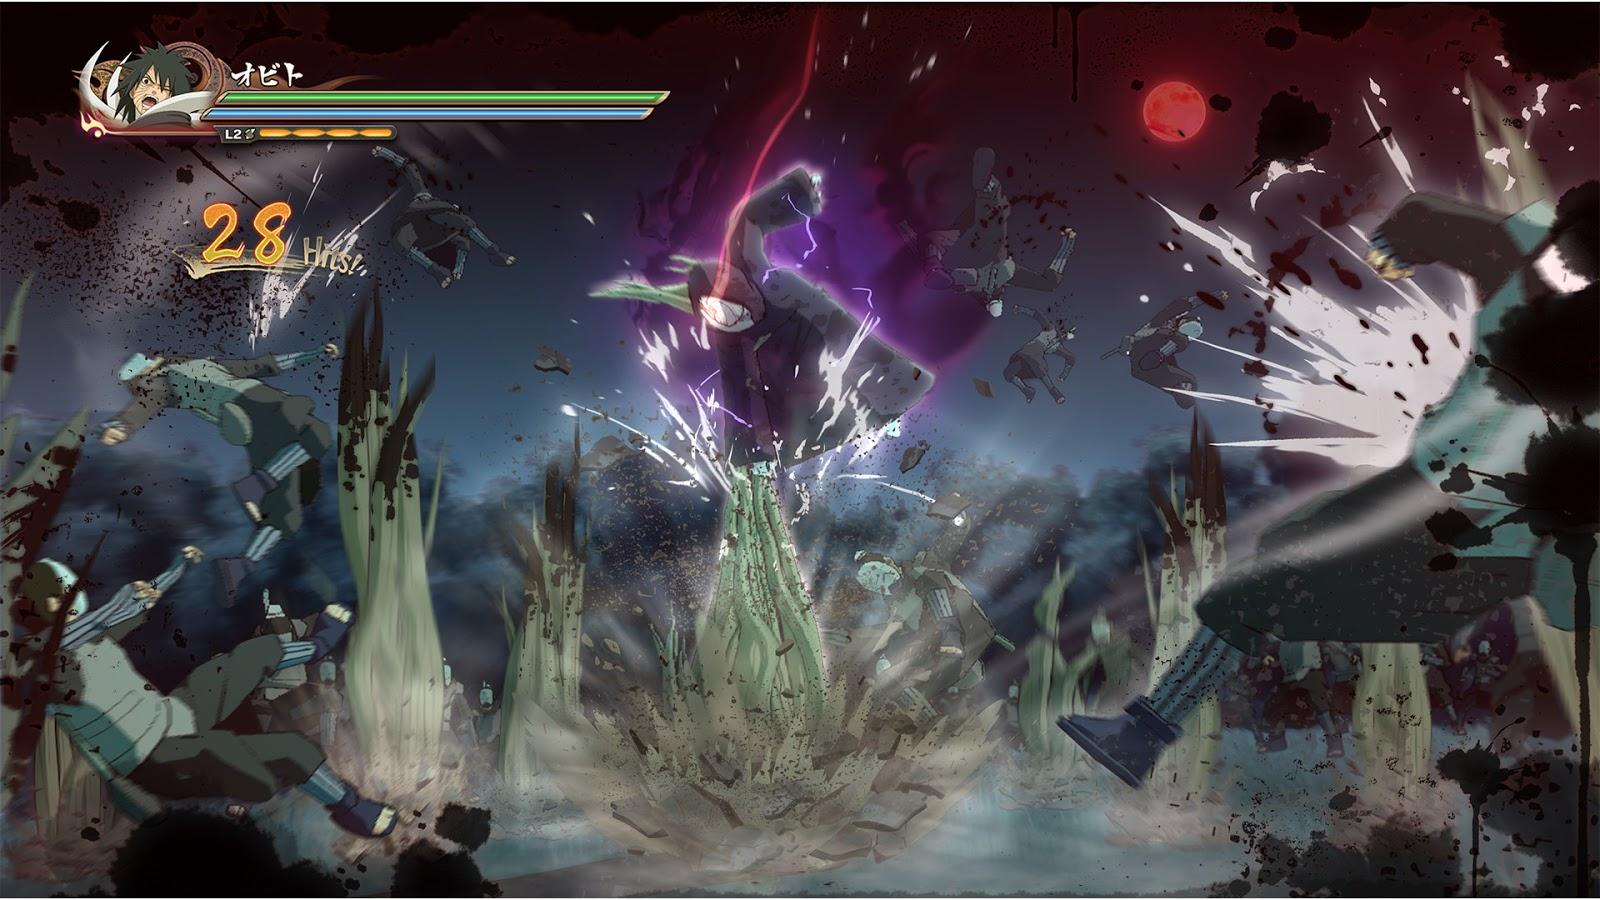 NARUTO SHIPPUDEN Ultimate Ninja STORM 4 ESPAÑOL PC Full + Road To Boruto DLC (PROPHET) + REPACK 8 DVD5 (JPW) 2